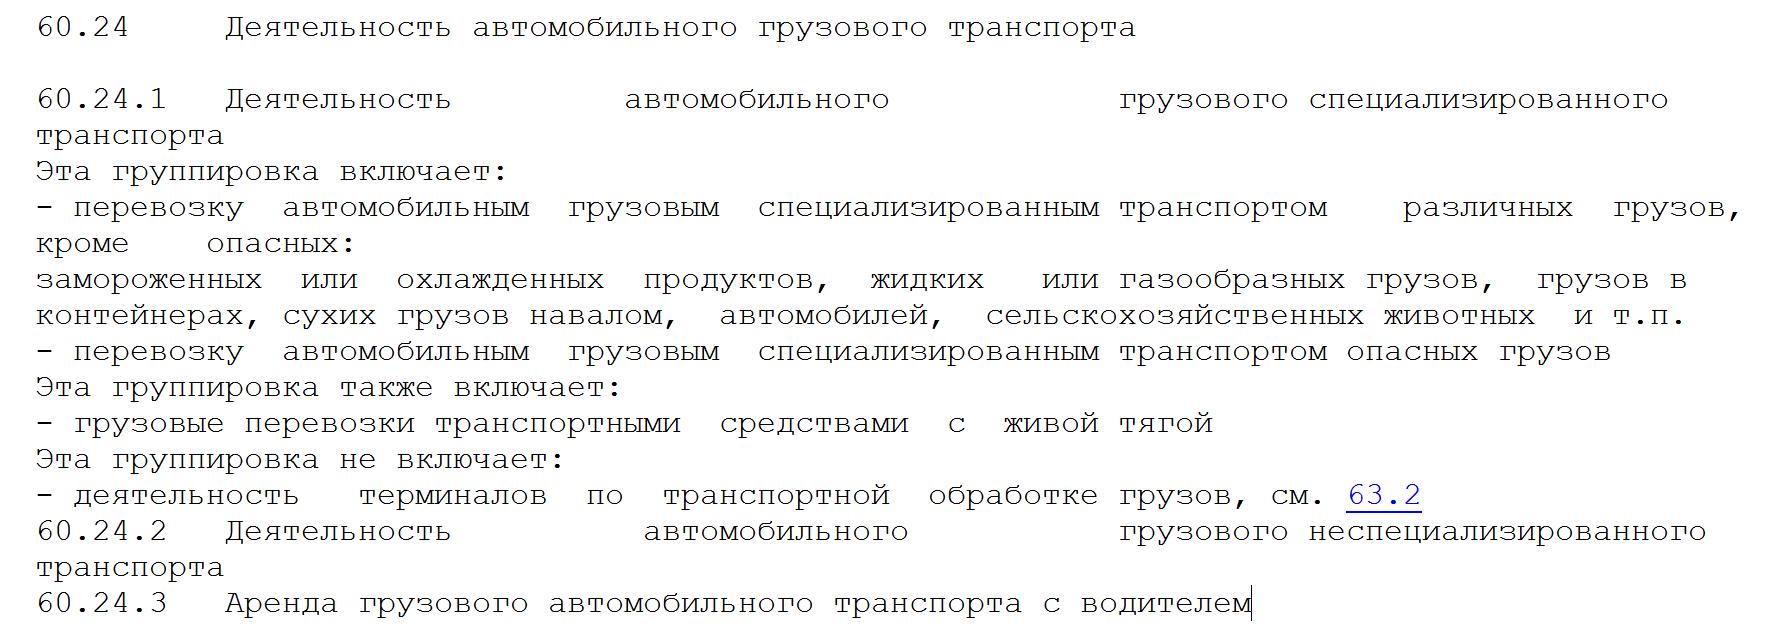 ОКВЭД 60.24 расшифровка